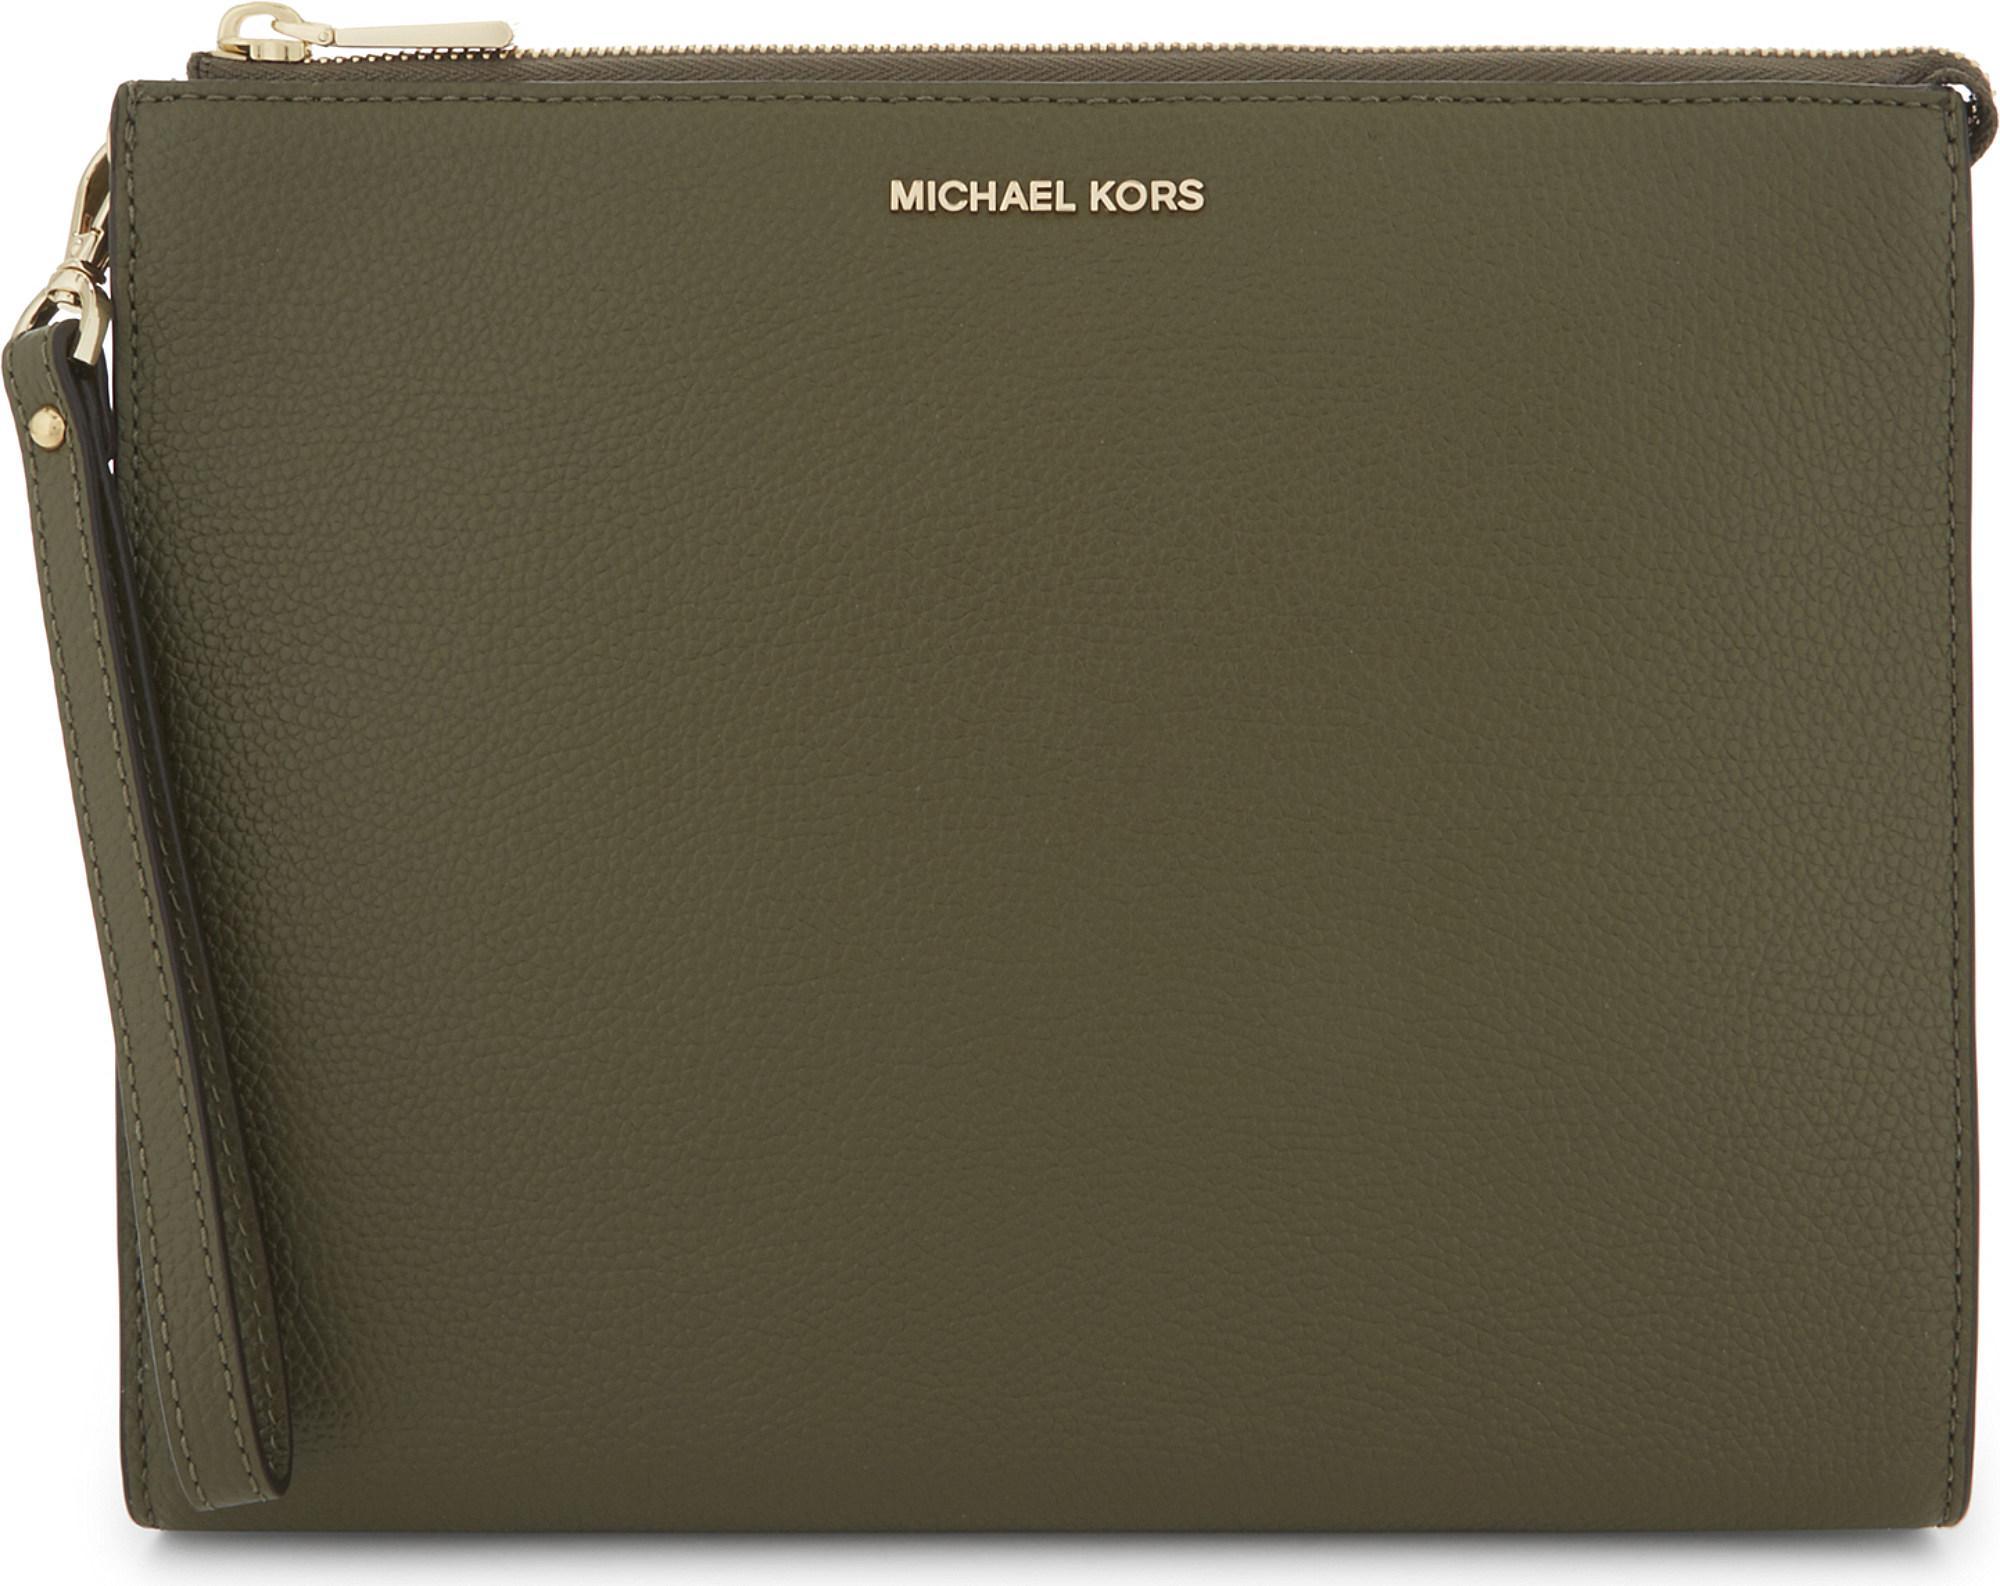 97d7d6c3dd41 MICHAEL Michael Kors Michael Kors Ladies Olive Practical Mercer ...